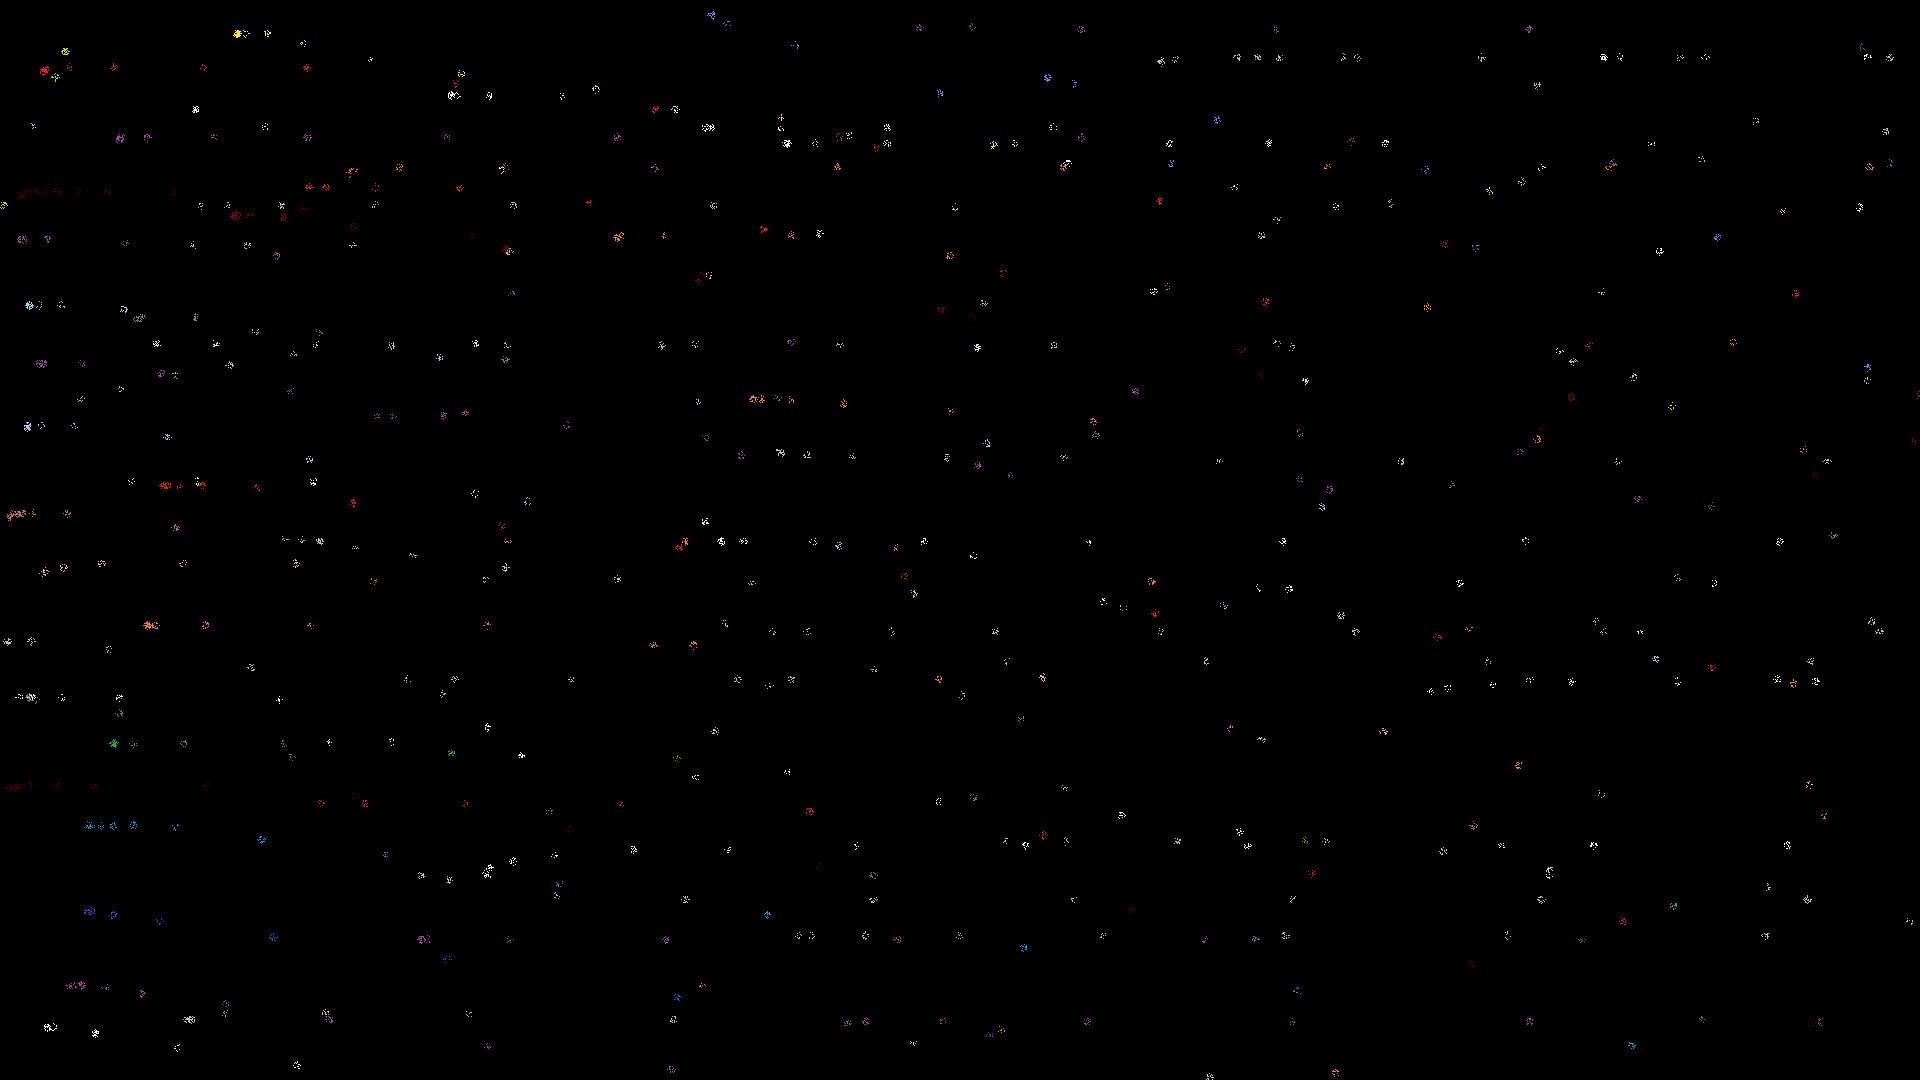 White Space Wallpaper Posted By Ryan Mercado